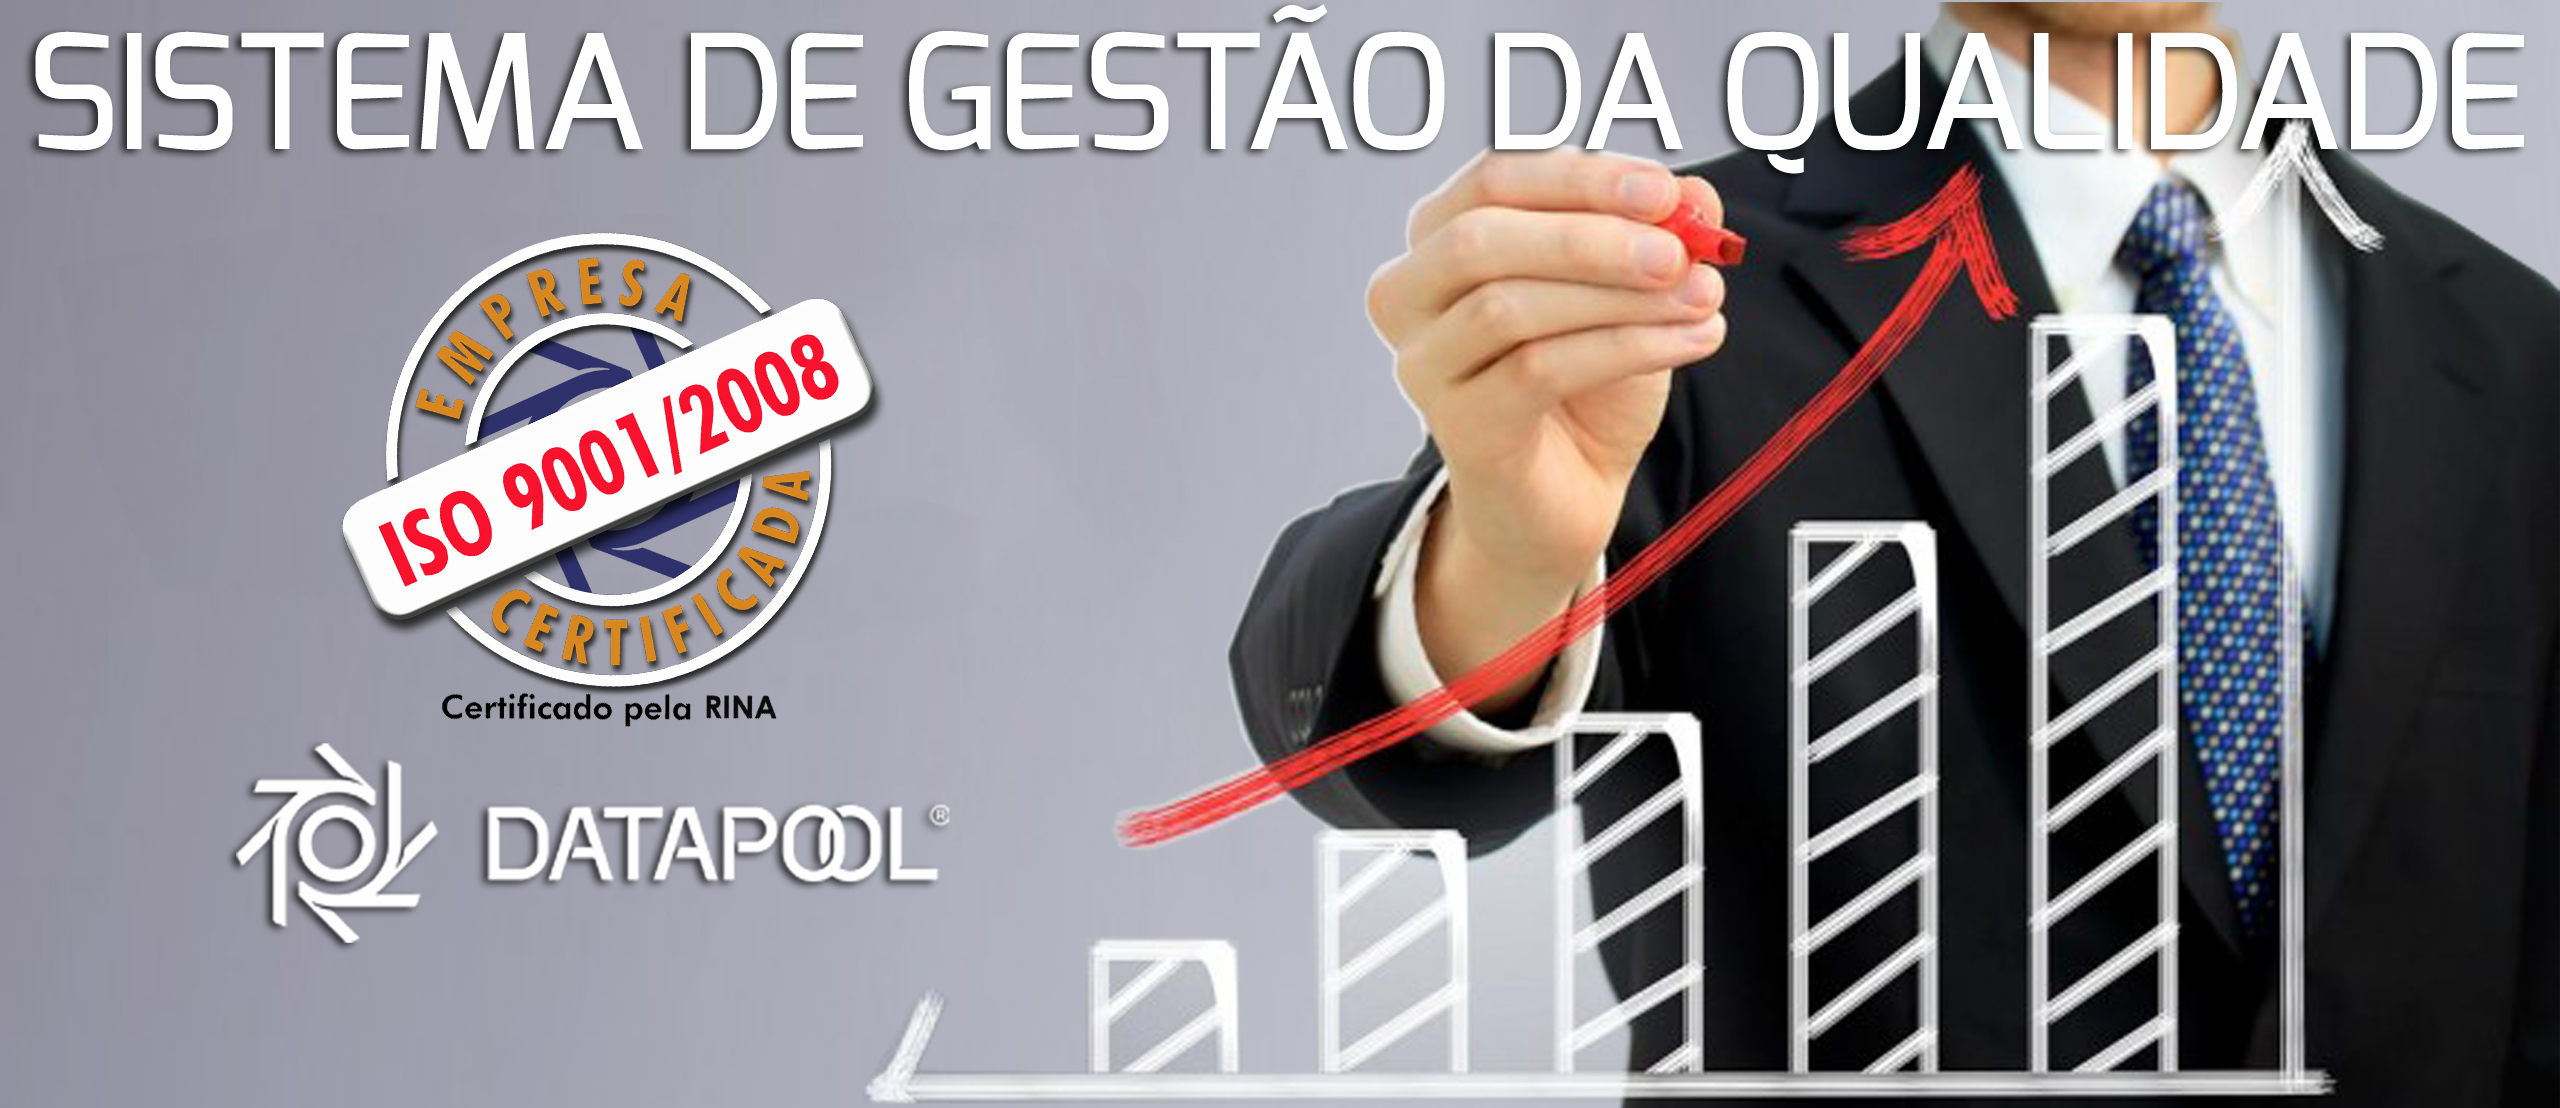 SGQ_Datapool